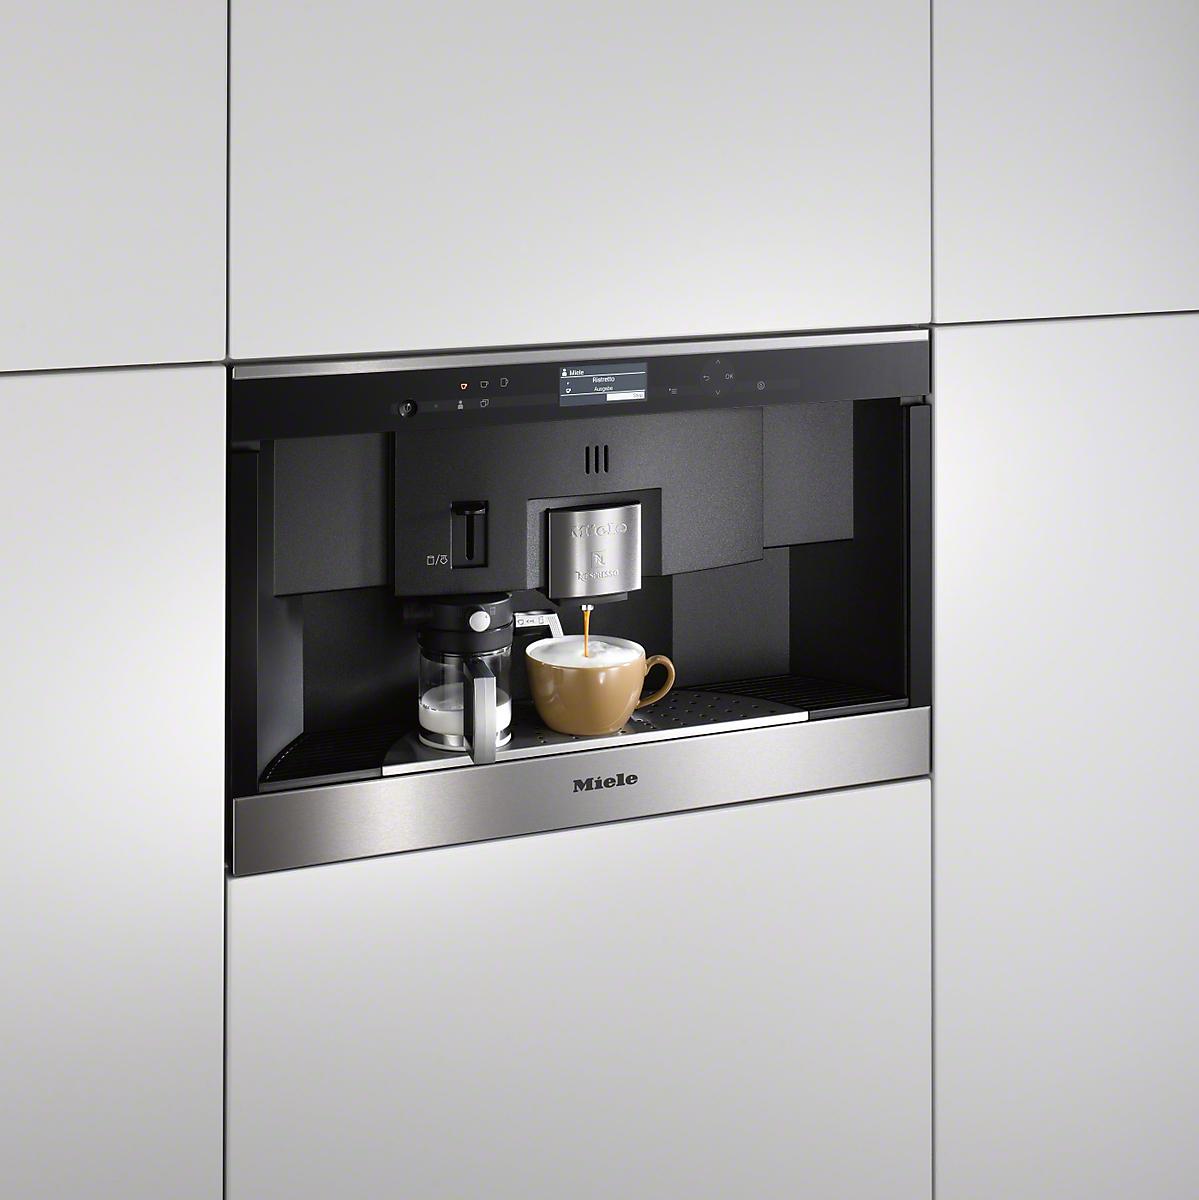 miele appliance features cvc cappuccinatore. Black Bedroom Furniture Sets. Home Design Ideas